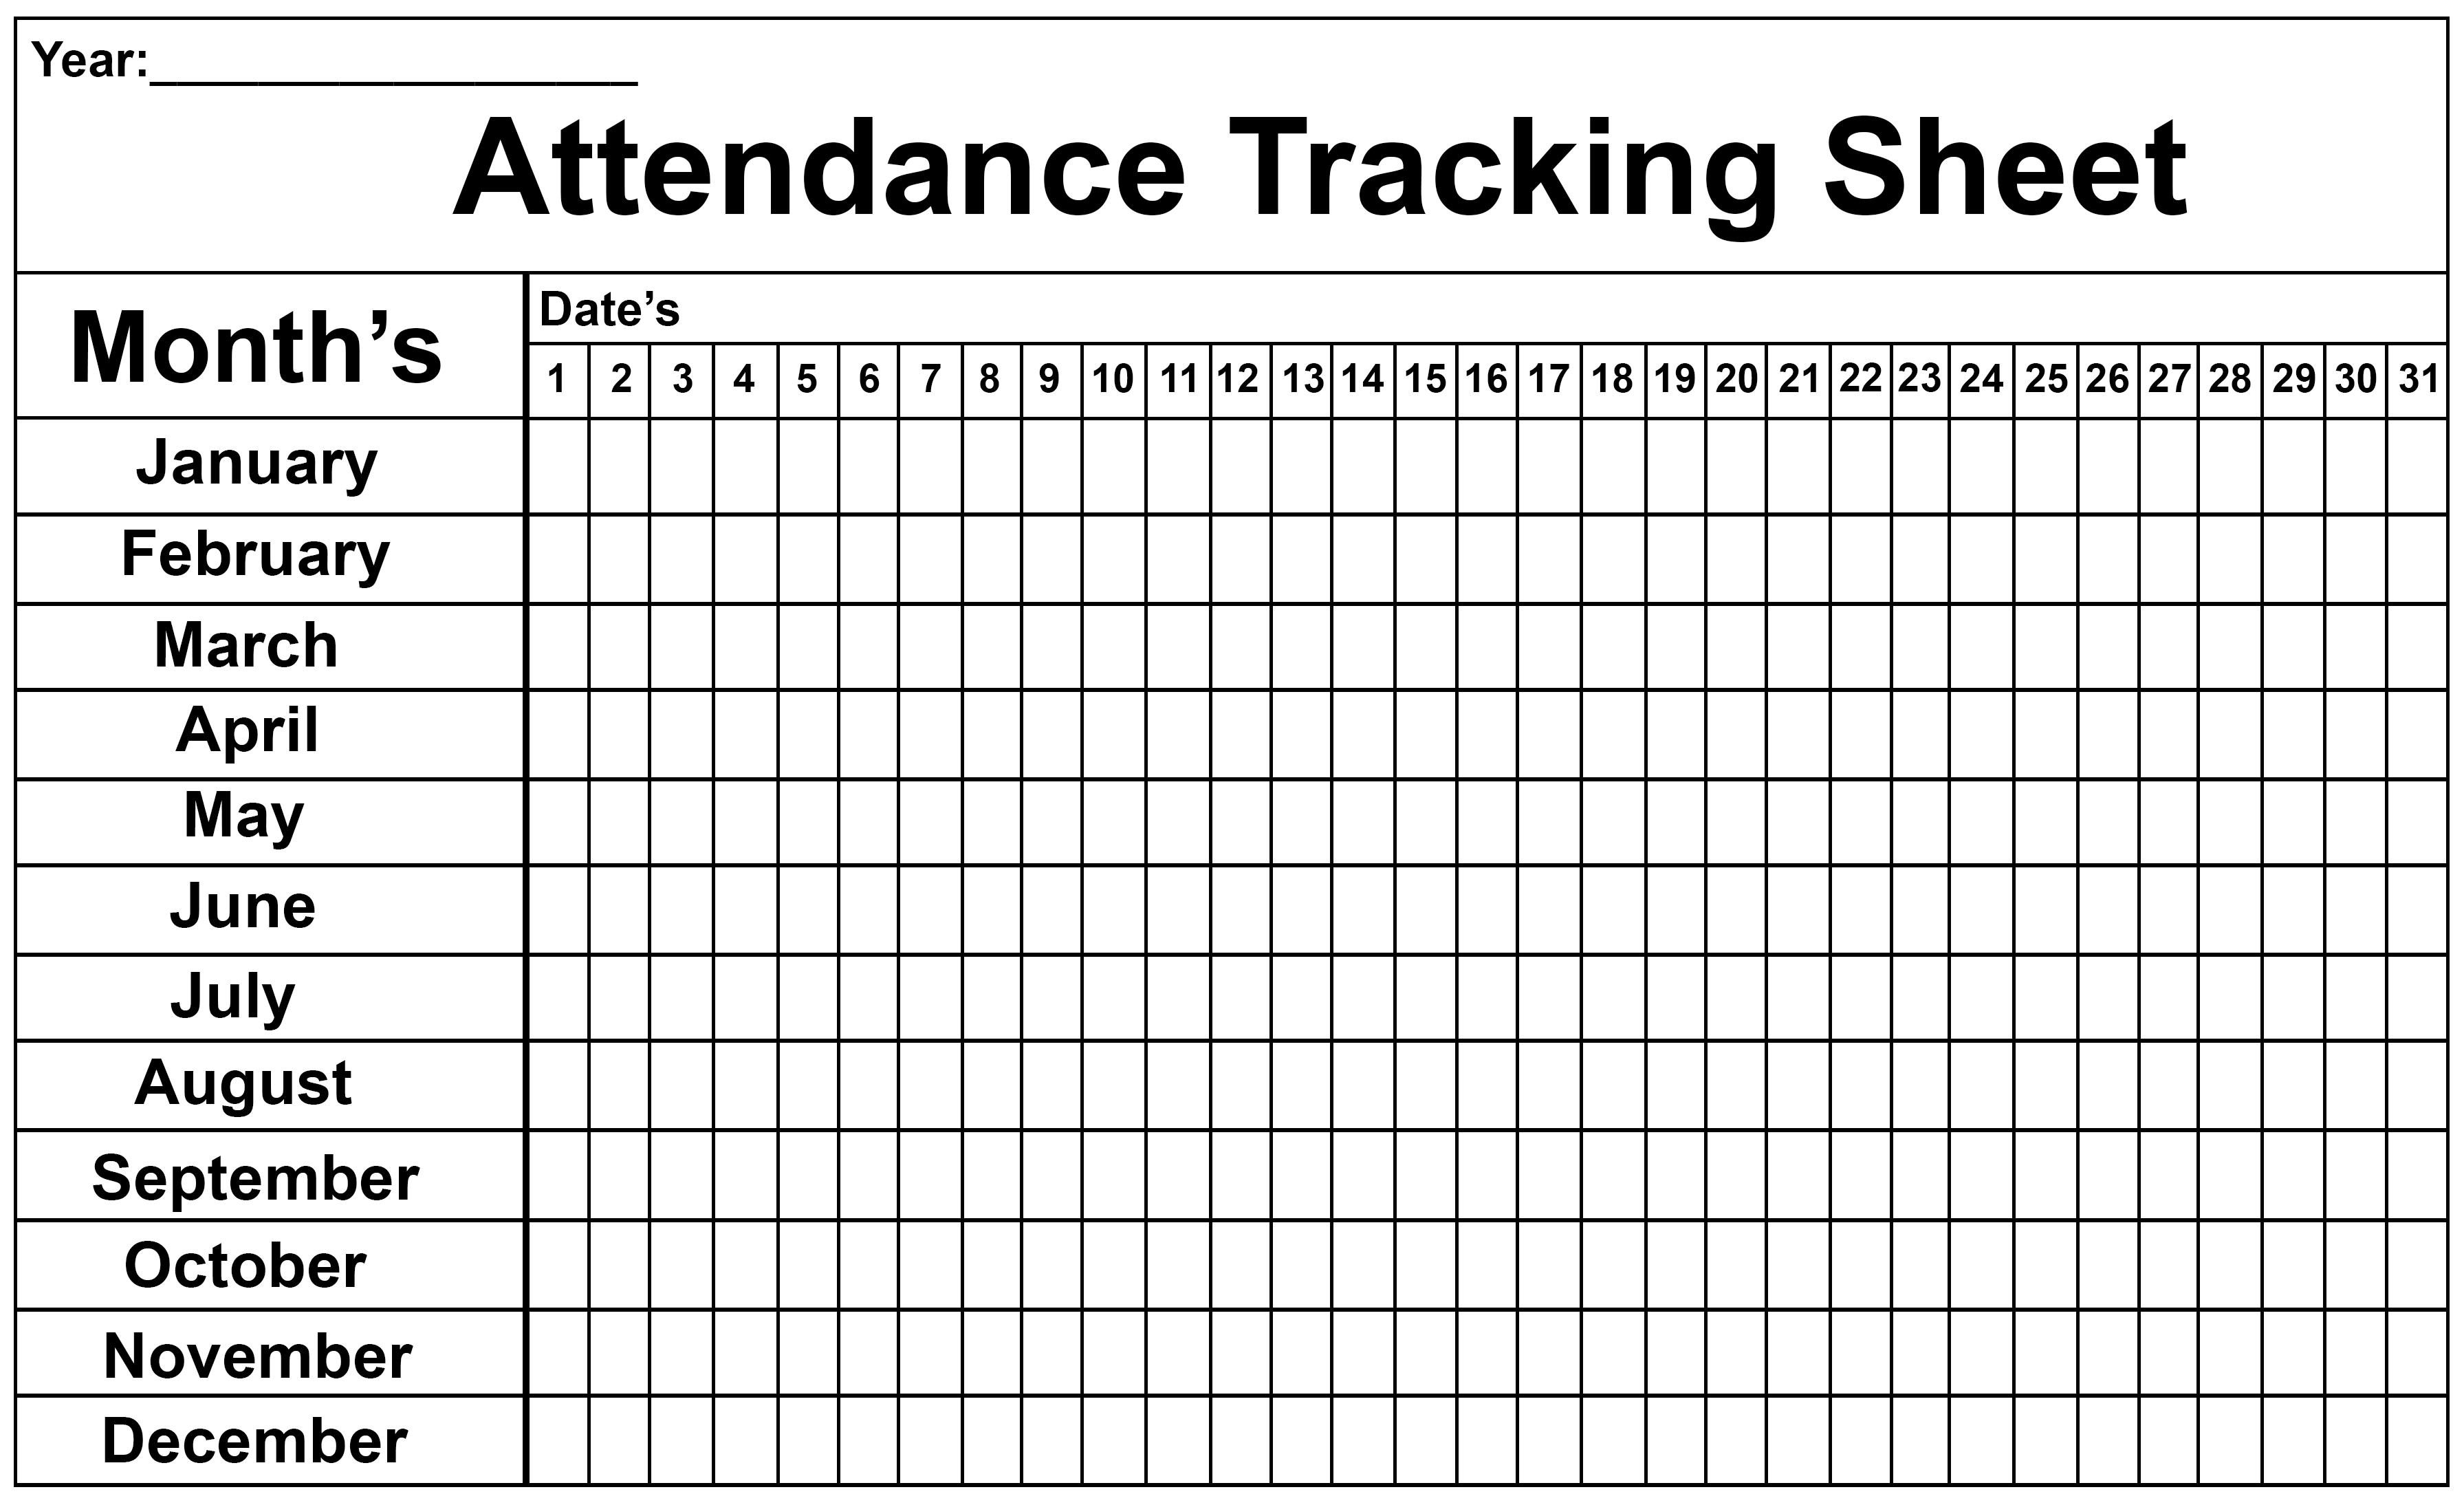 Employee Attendance Tracker Sheet 2019 | Printable Calendar Diy